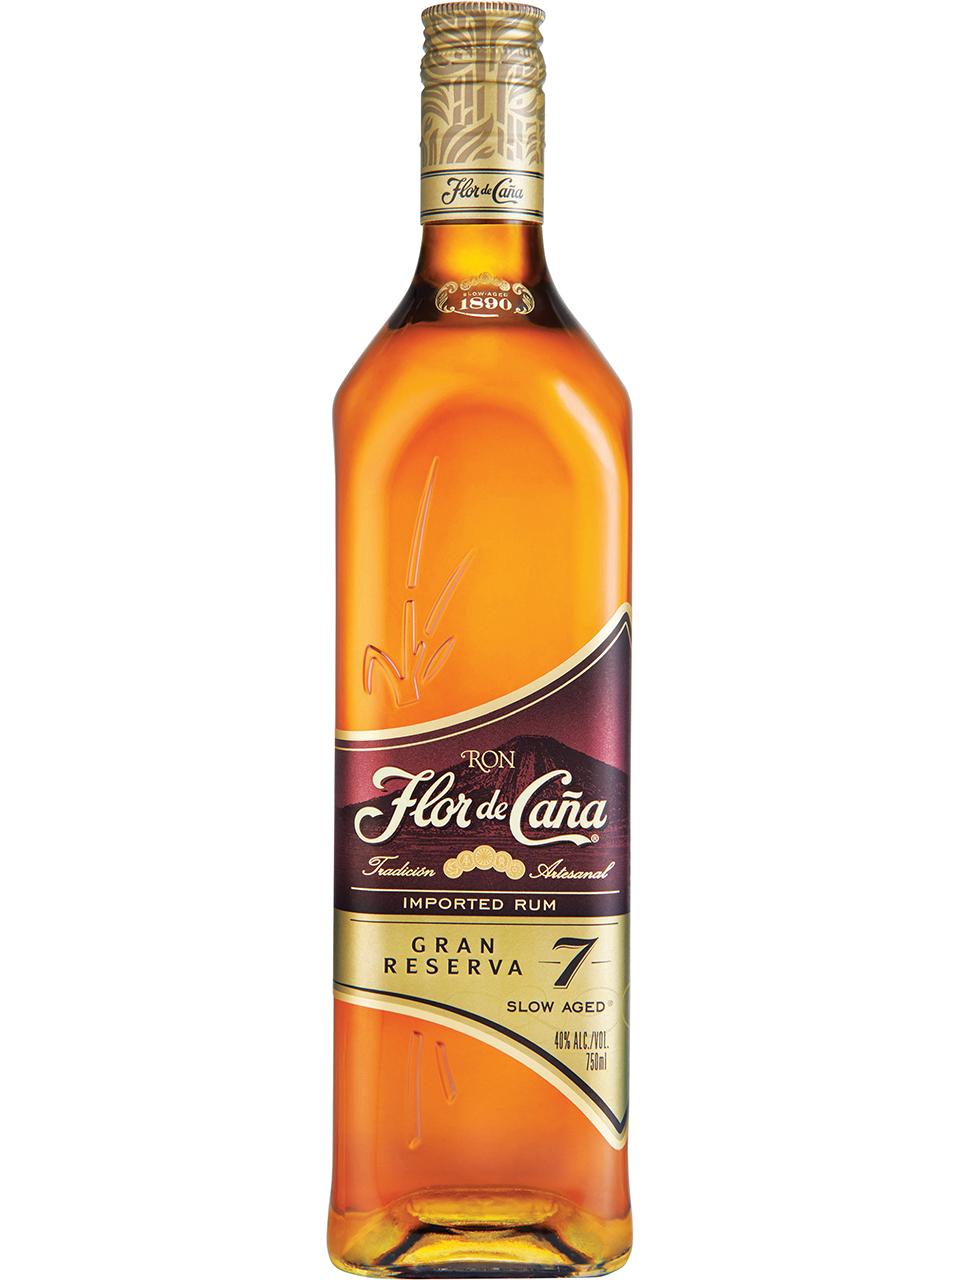 Flor de Cana Grand Reserve 7 YO Rum